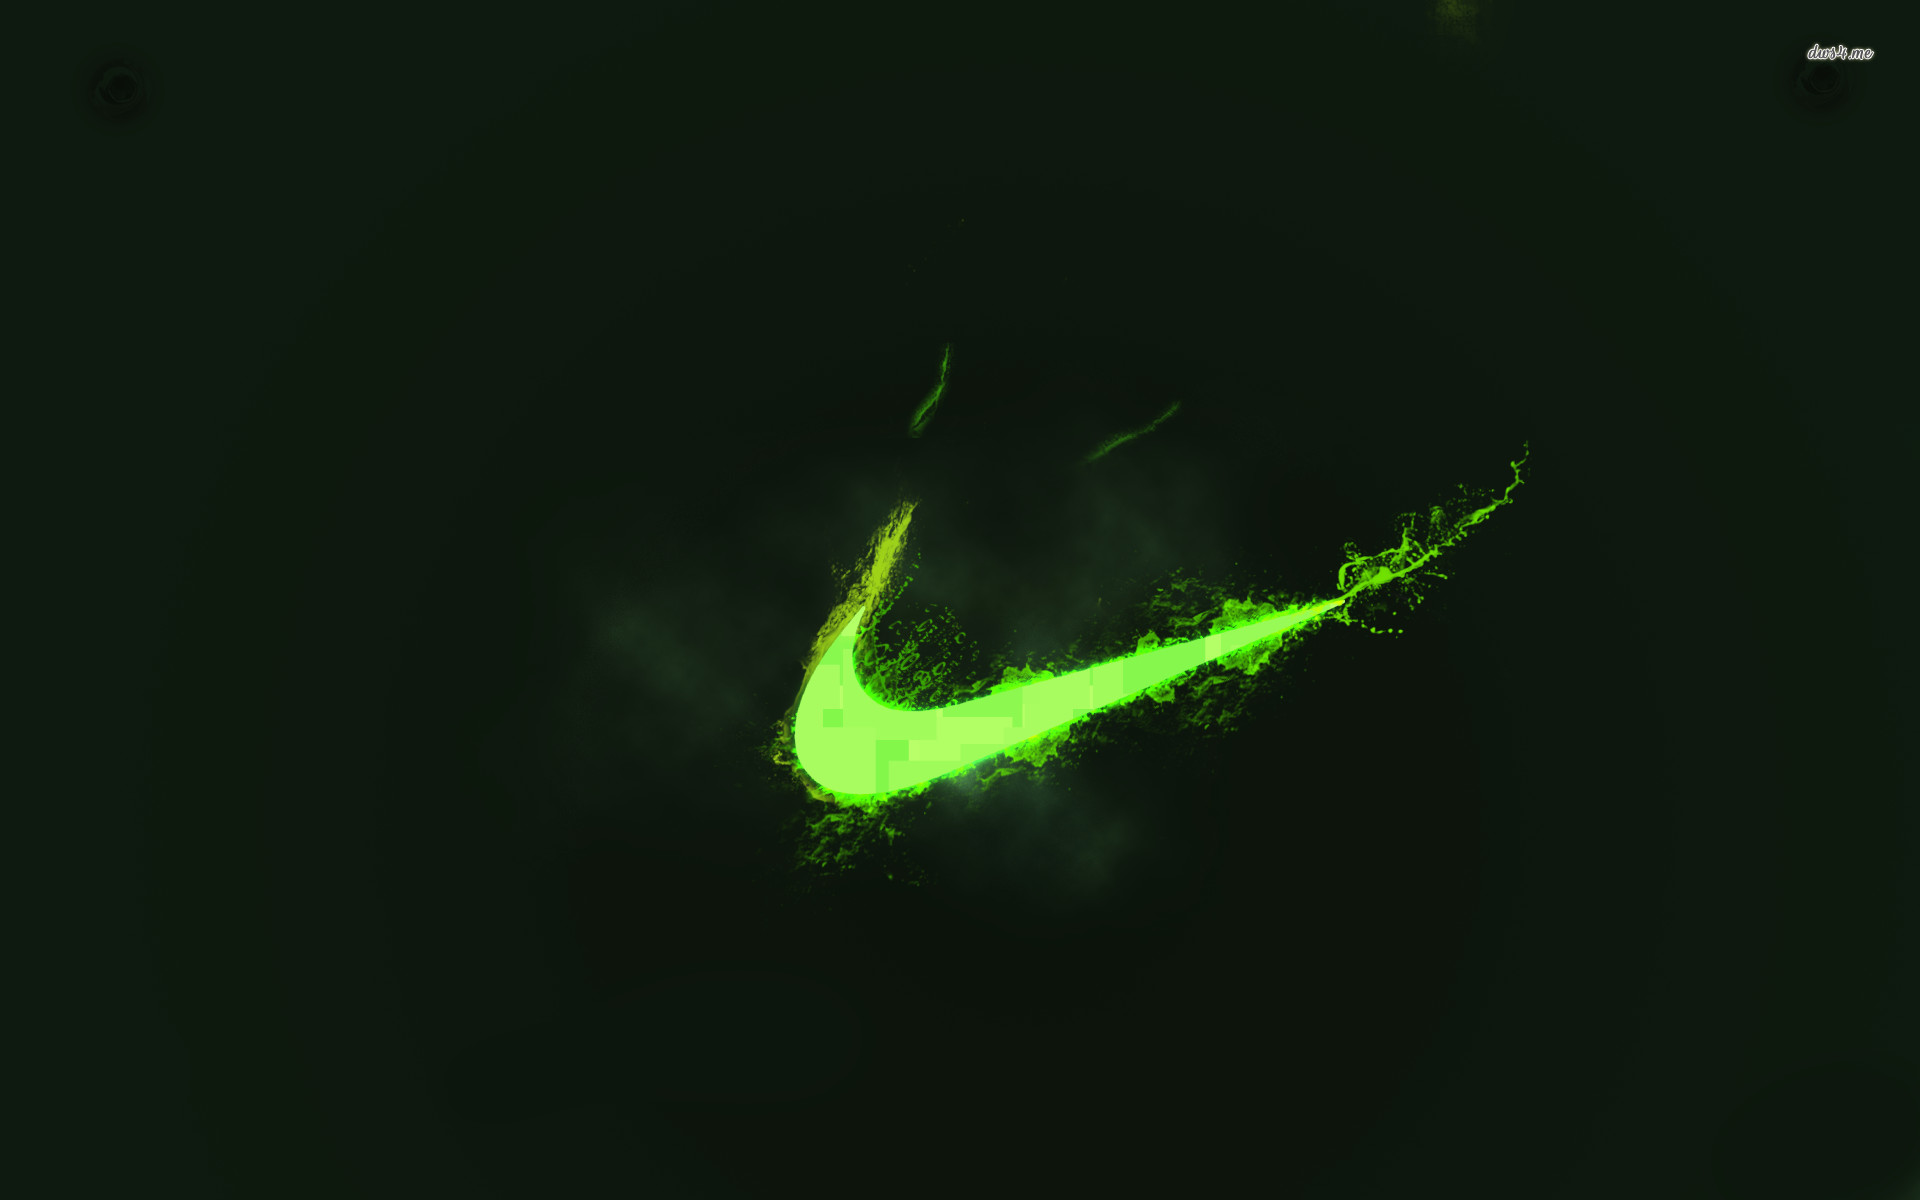 20478-neon-green-nike-logo-1920×1200-digital-art-